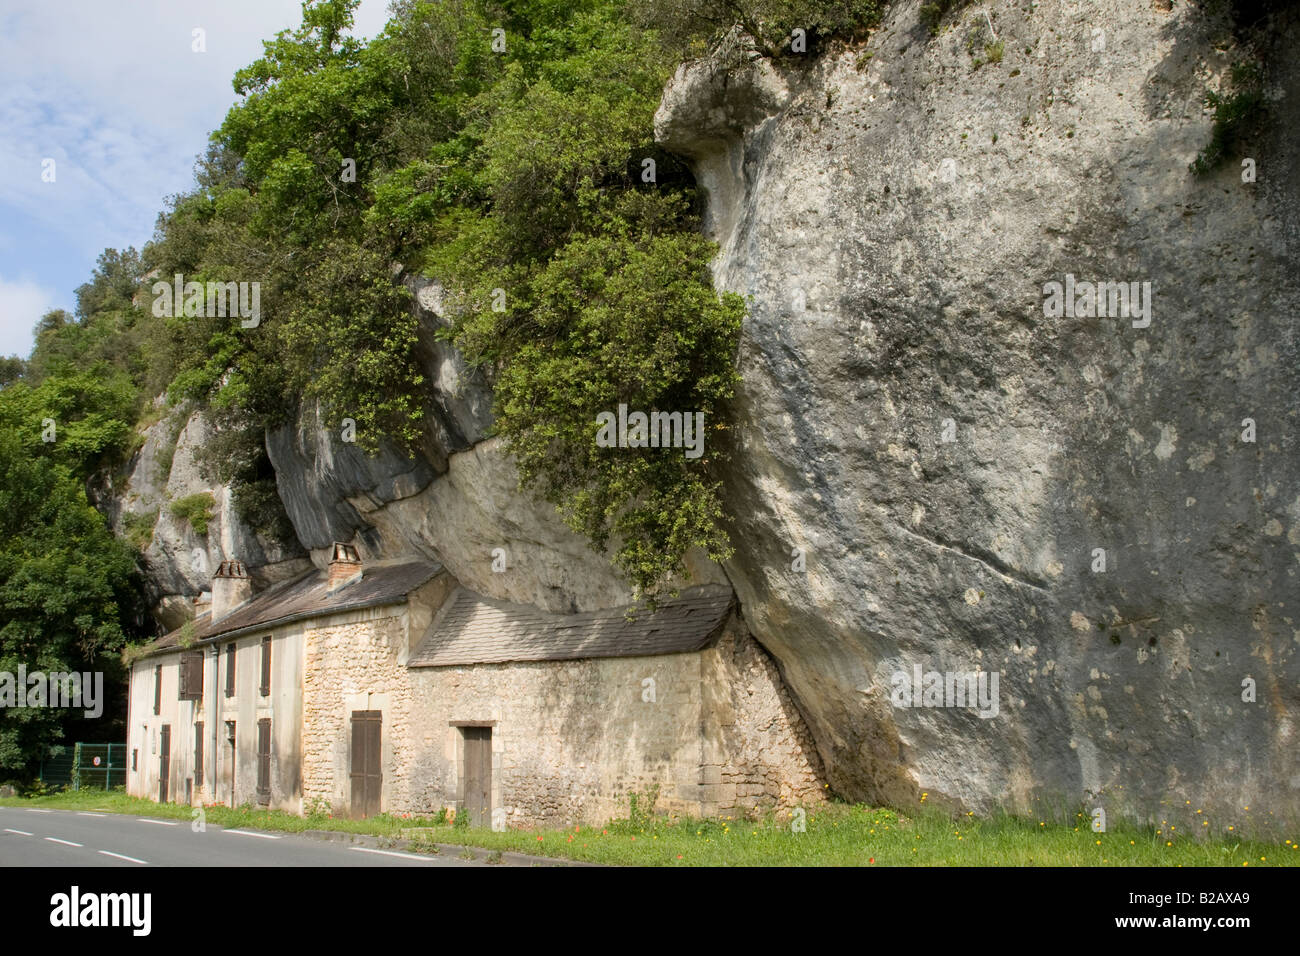 7 Amazing Houses Built Into Nature: Palaeolithic Stock Photos & Palaeolithic Stock Images